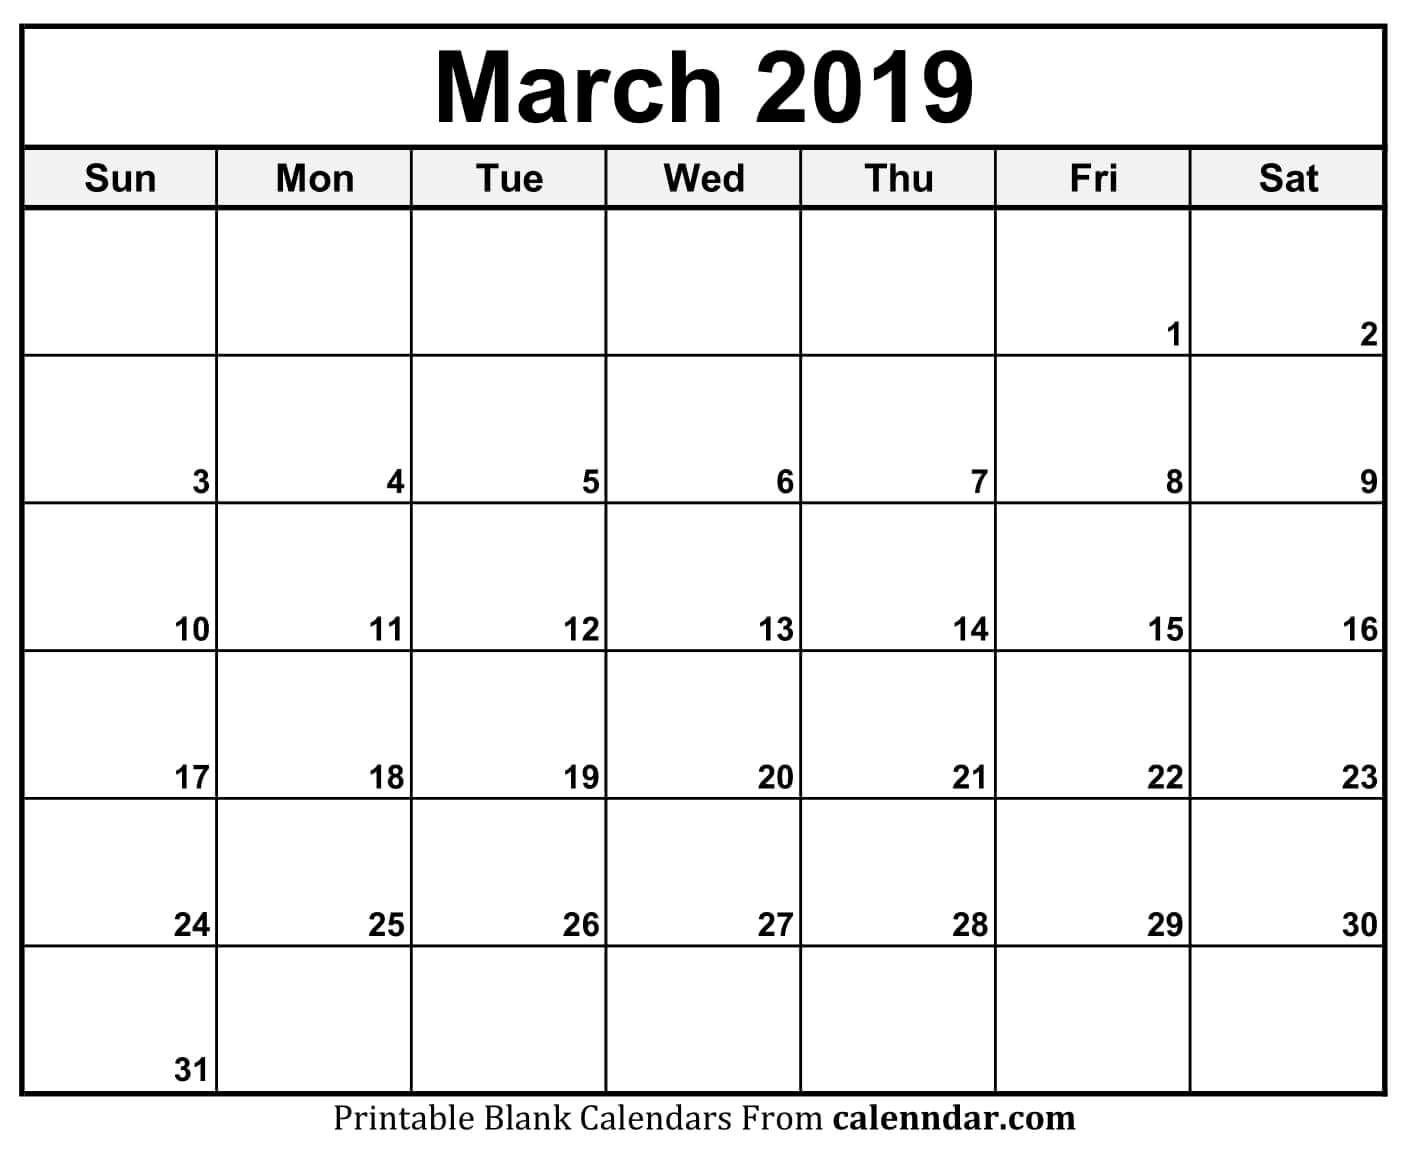 Calendar 2019 March Printable Template Download June 2019